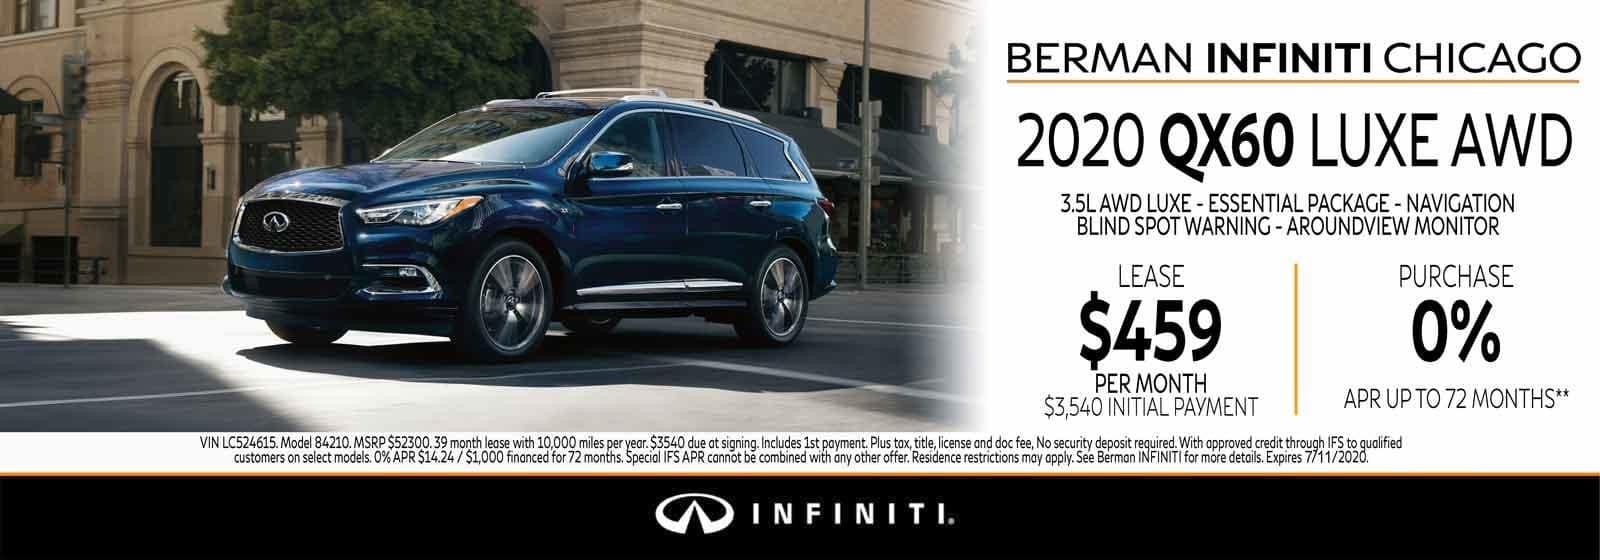 New 2020 INFINITI QX60 July offer at Berman INFINITI Chicago!